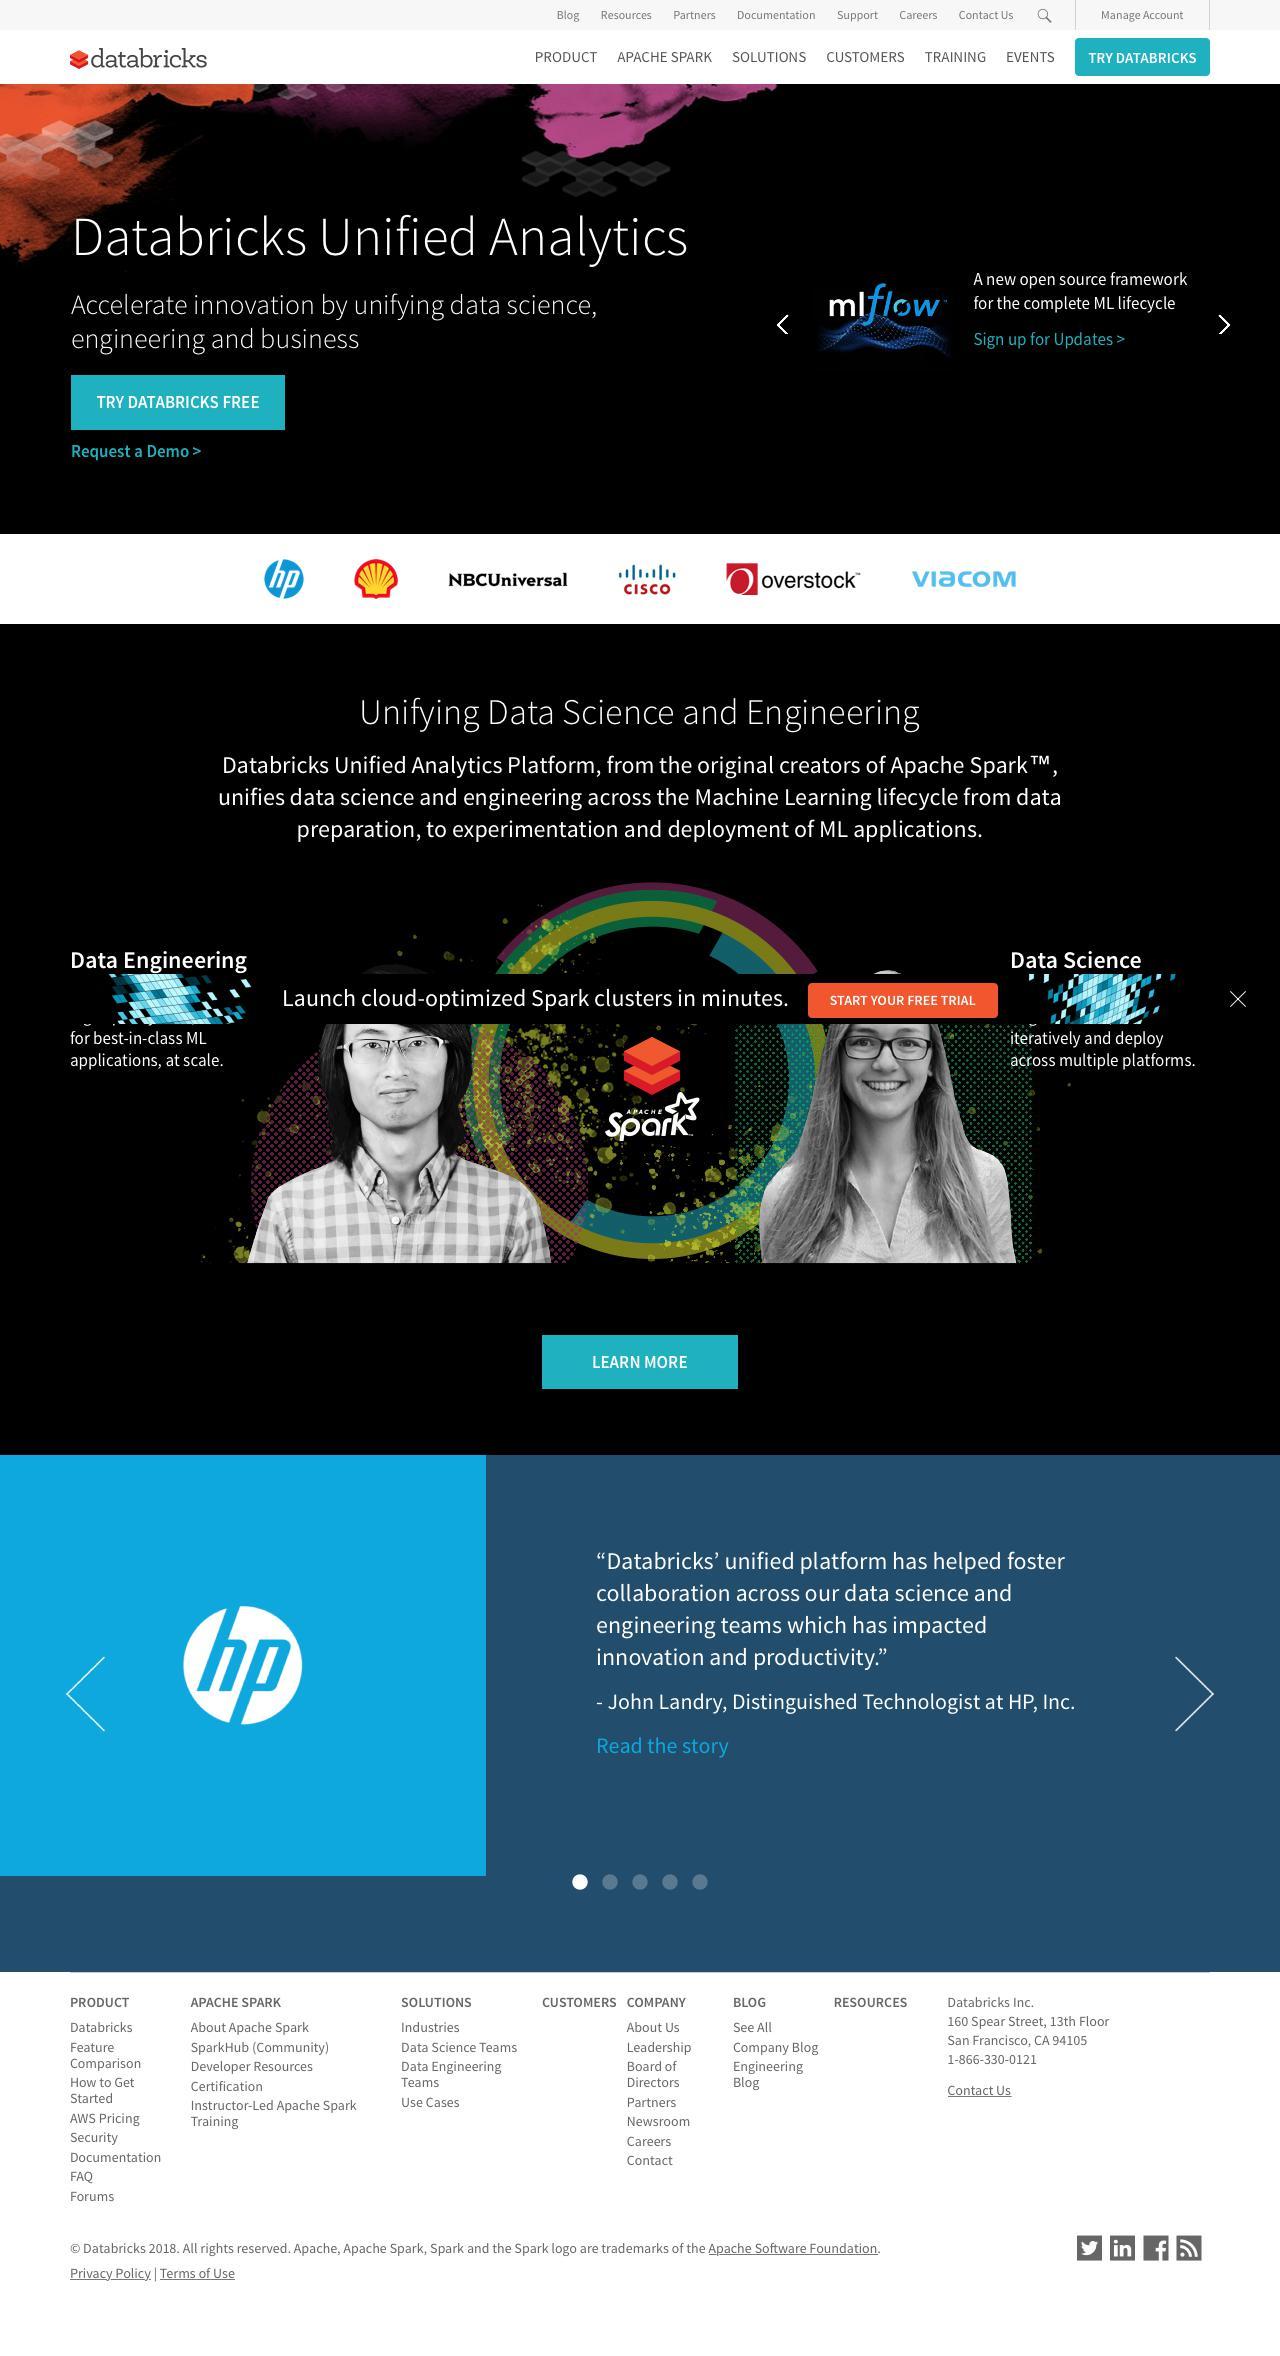 Screenshot of databricks.com - Databricks - Making Big Data Simple - captured June 8, 2018